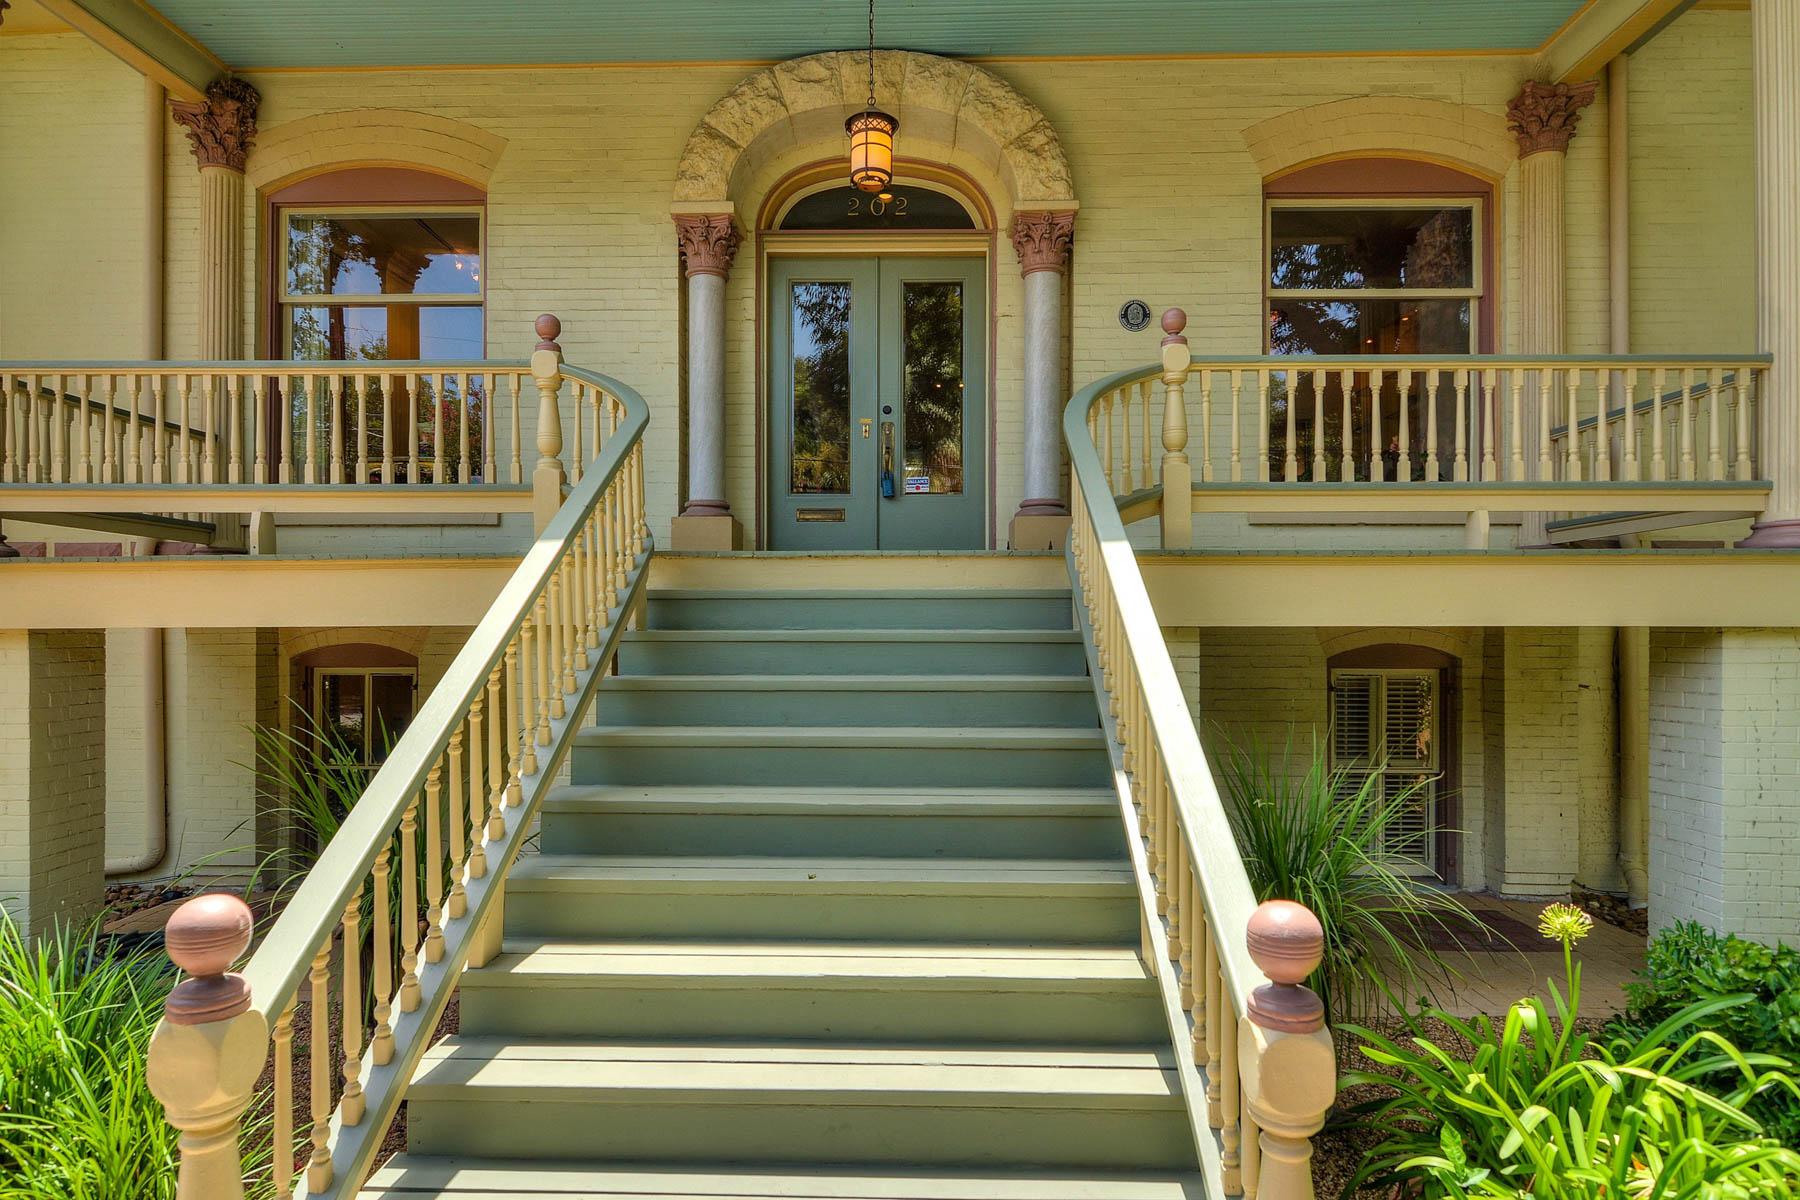 Additional photo for property listing at Majestic, Yet Wonderfully Urban King William Home 202 Madison St San Antonio, Texas 78204 Estados Unidos